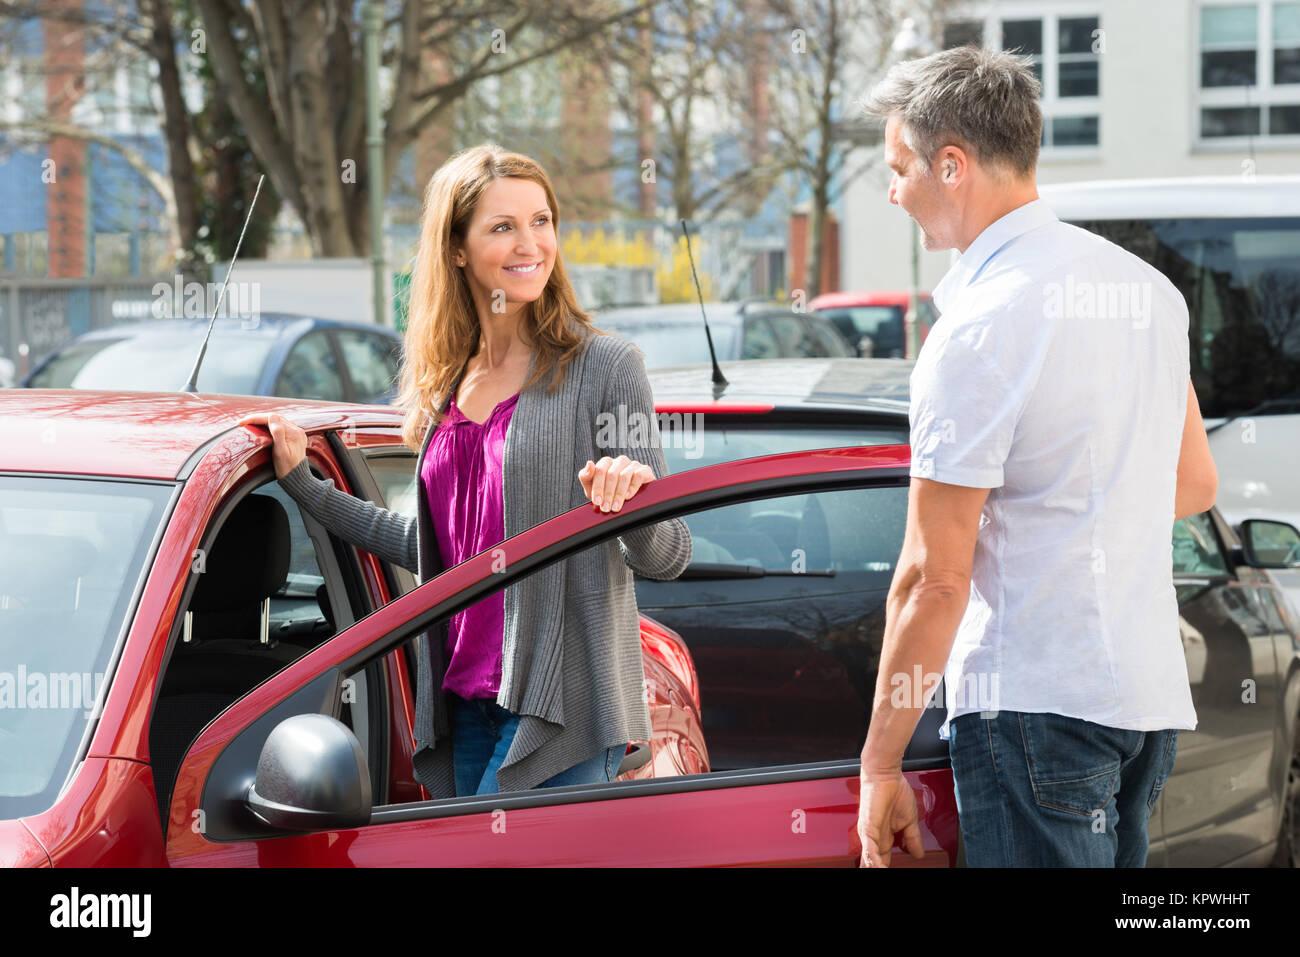 Couple Standing By New Car Door - Stock Image